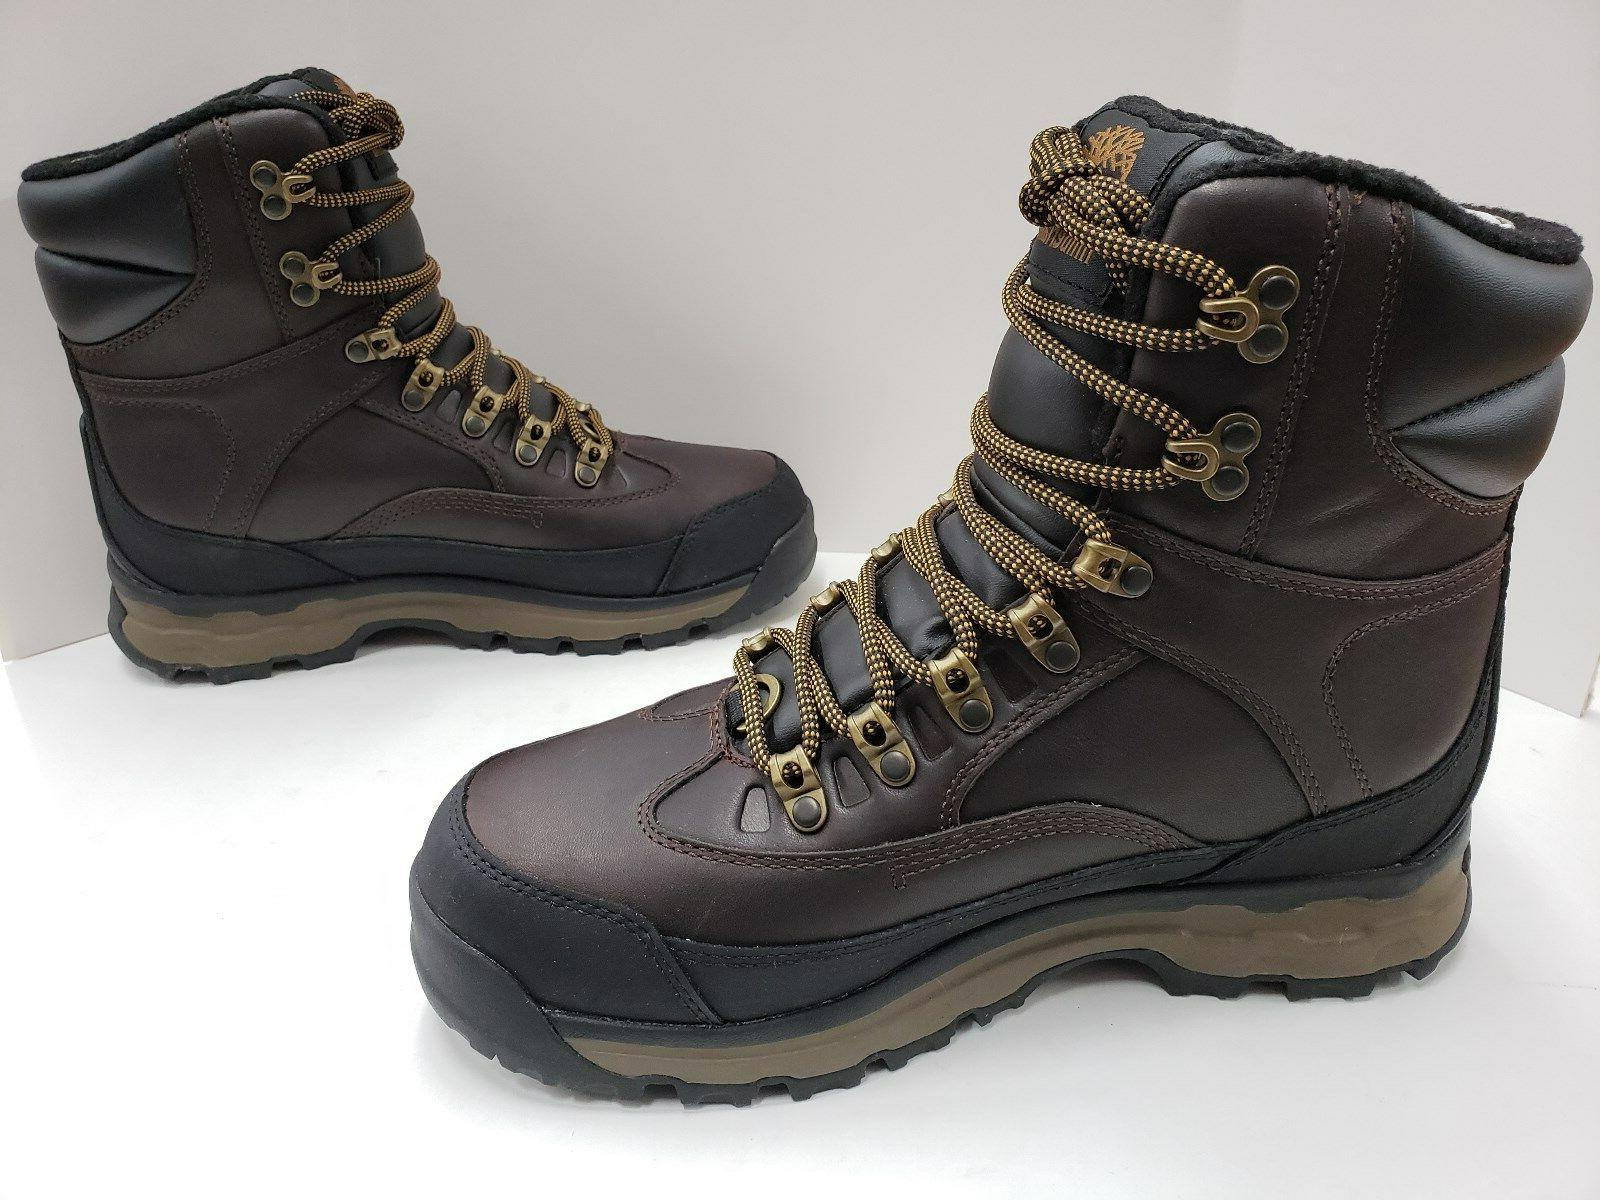 "Mens 8"" Waterproof Boot"